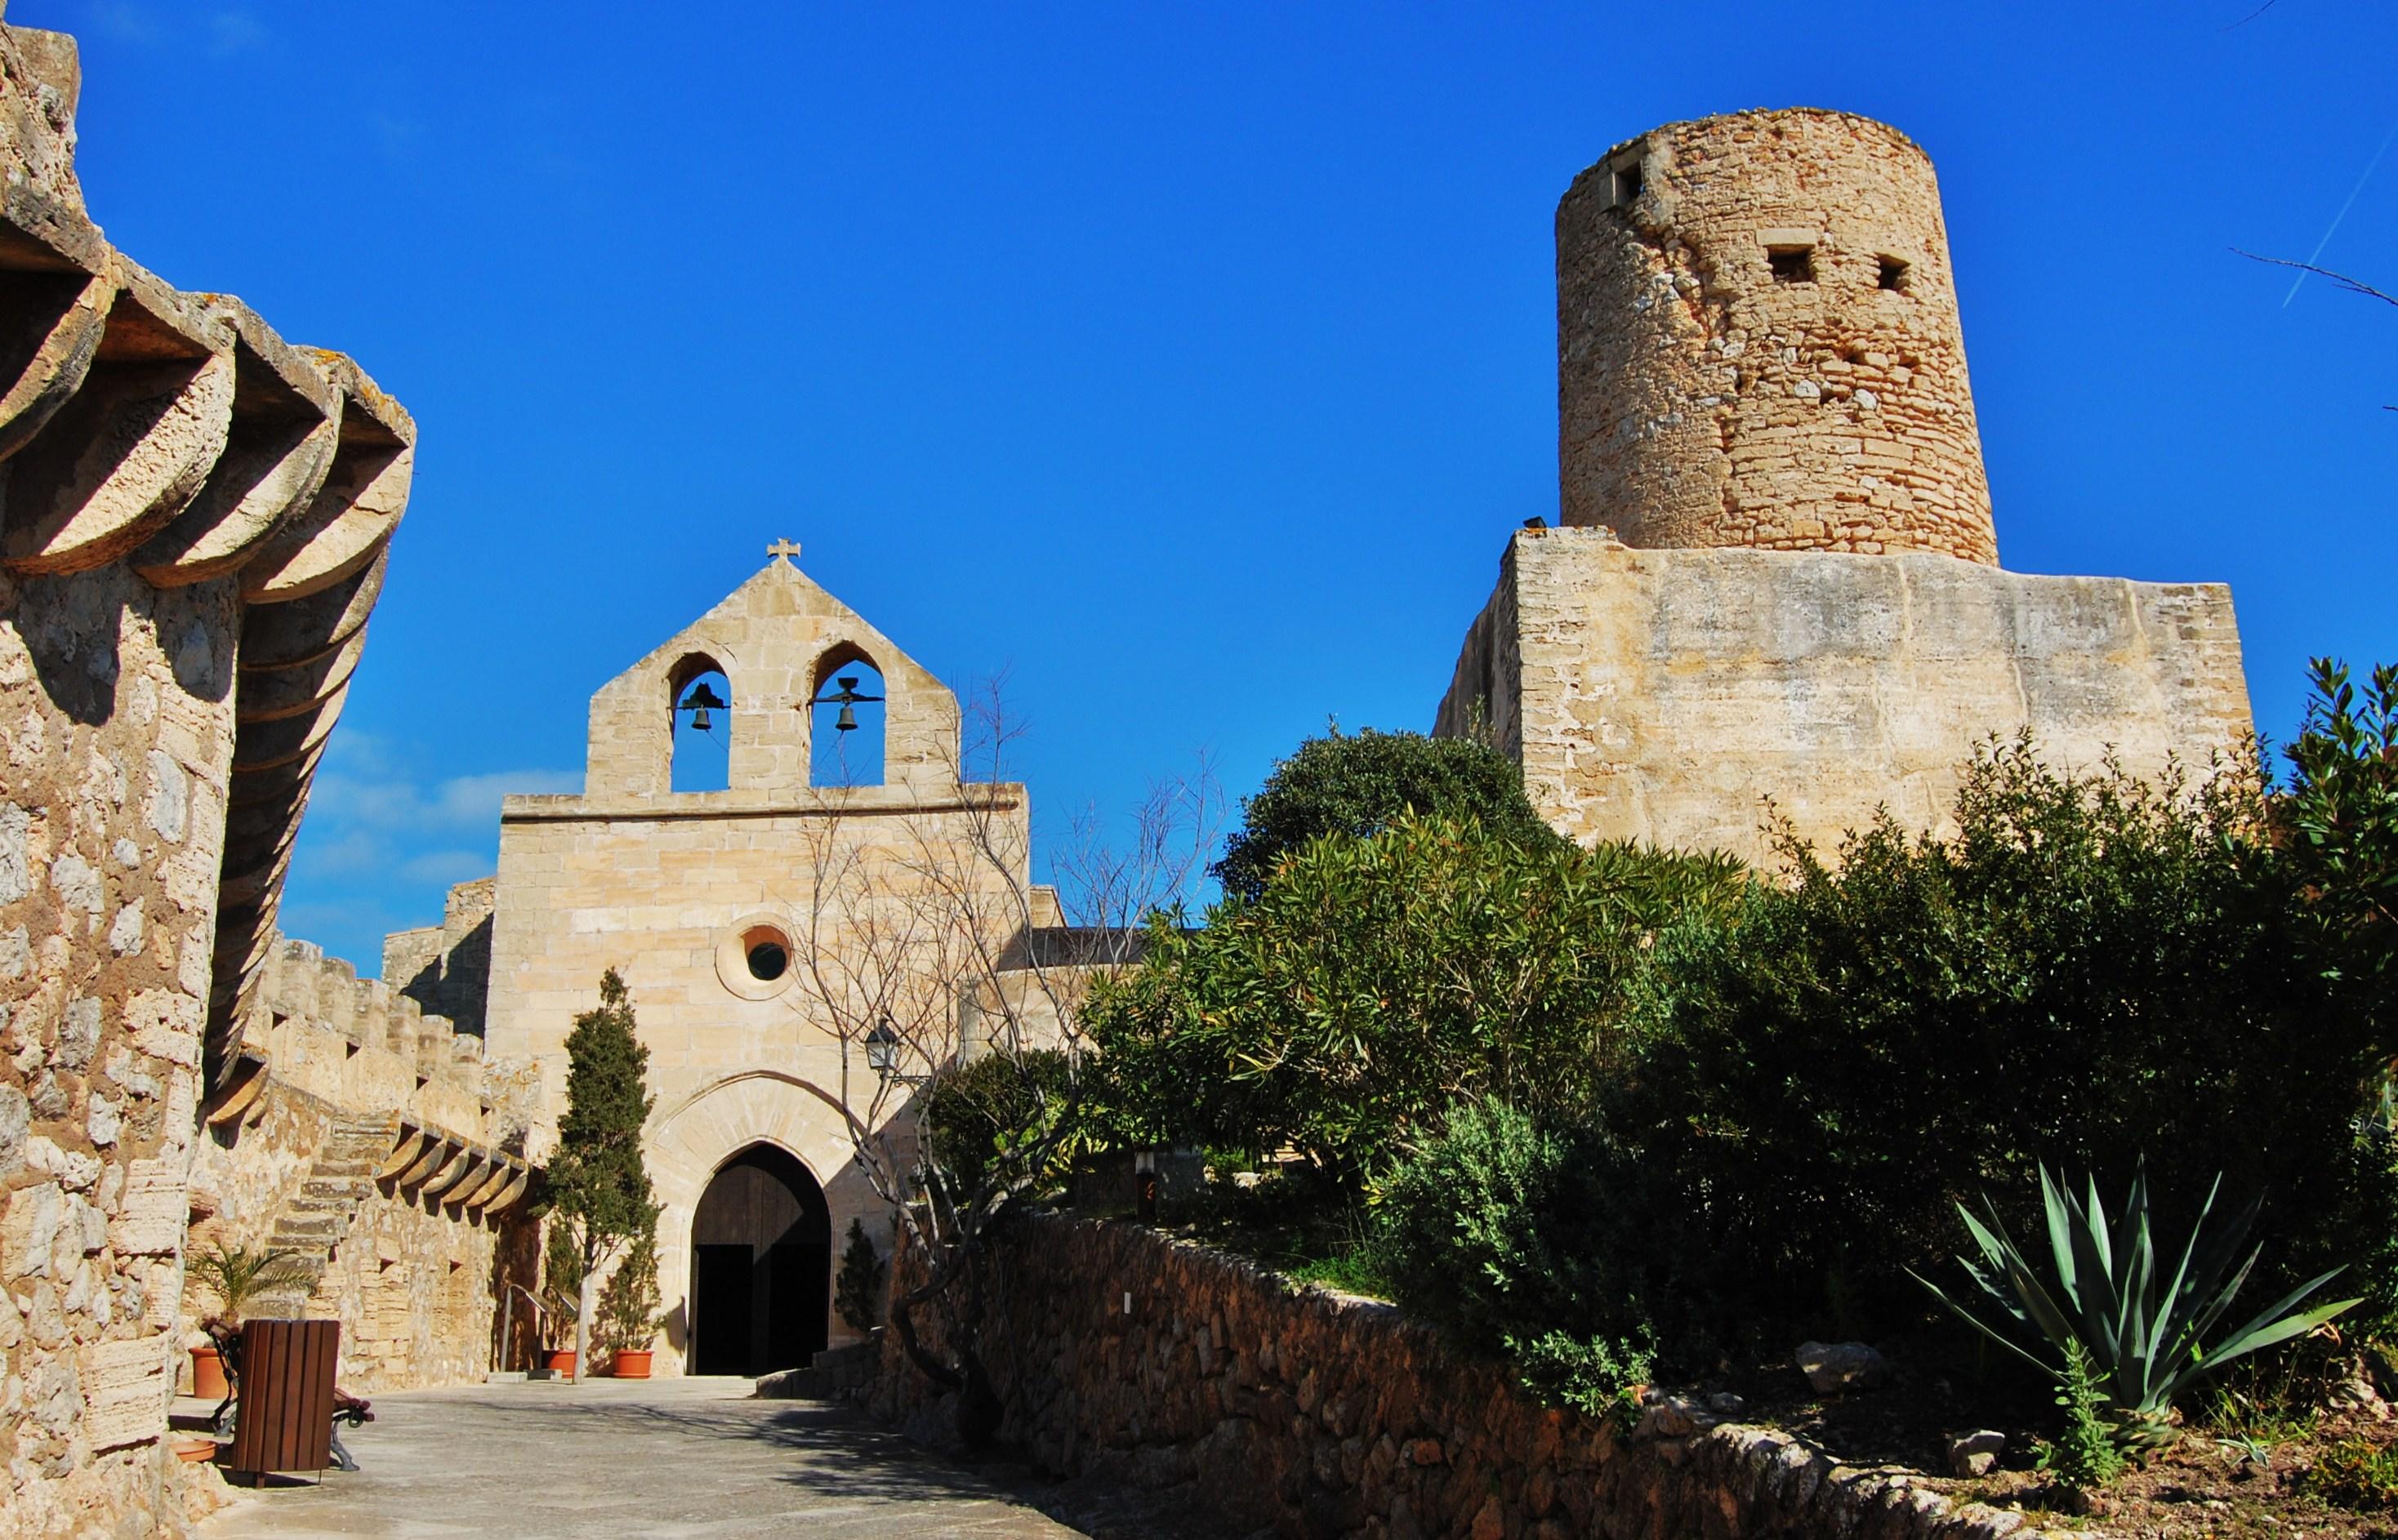 File:Castell de Capdepera - 4.jpg - Wikimedia Commons